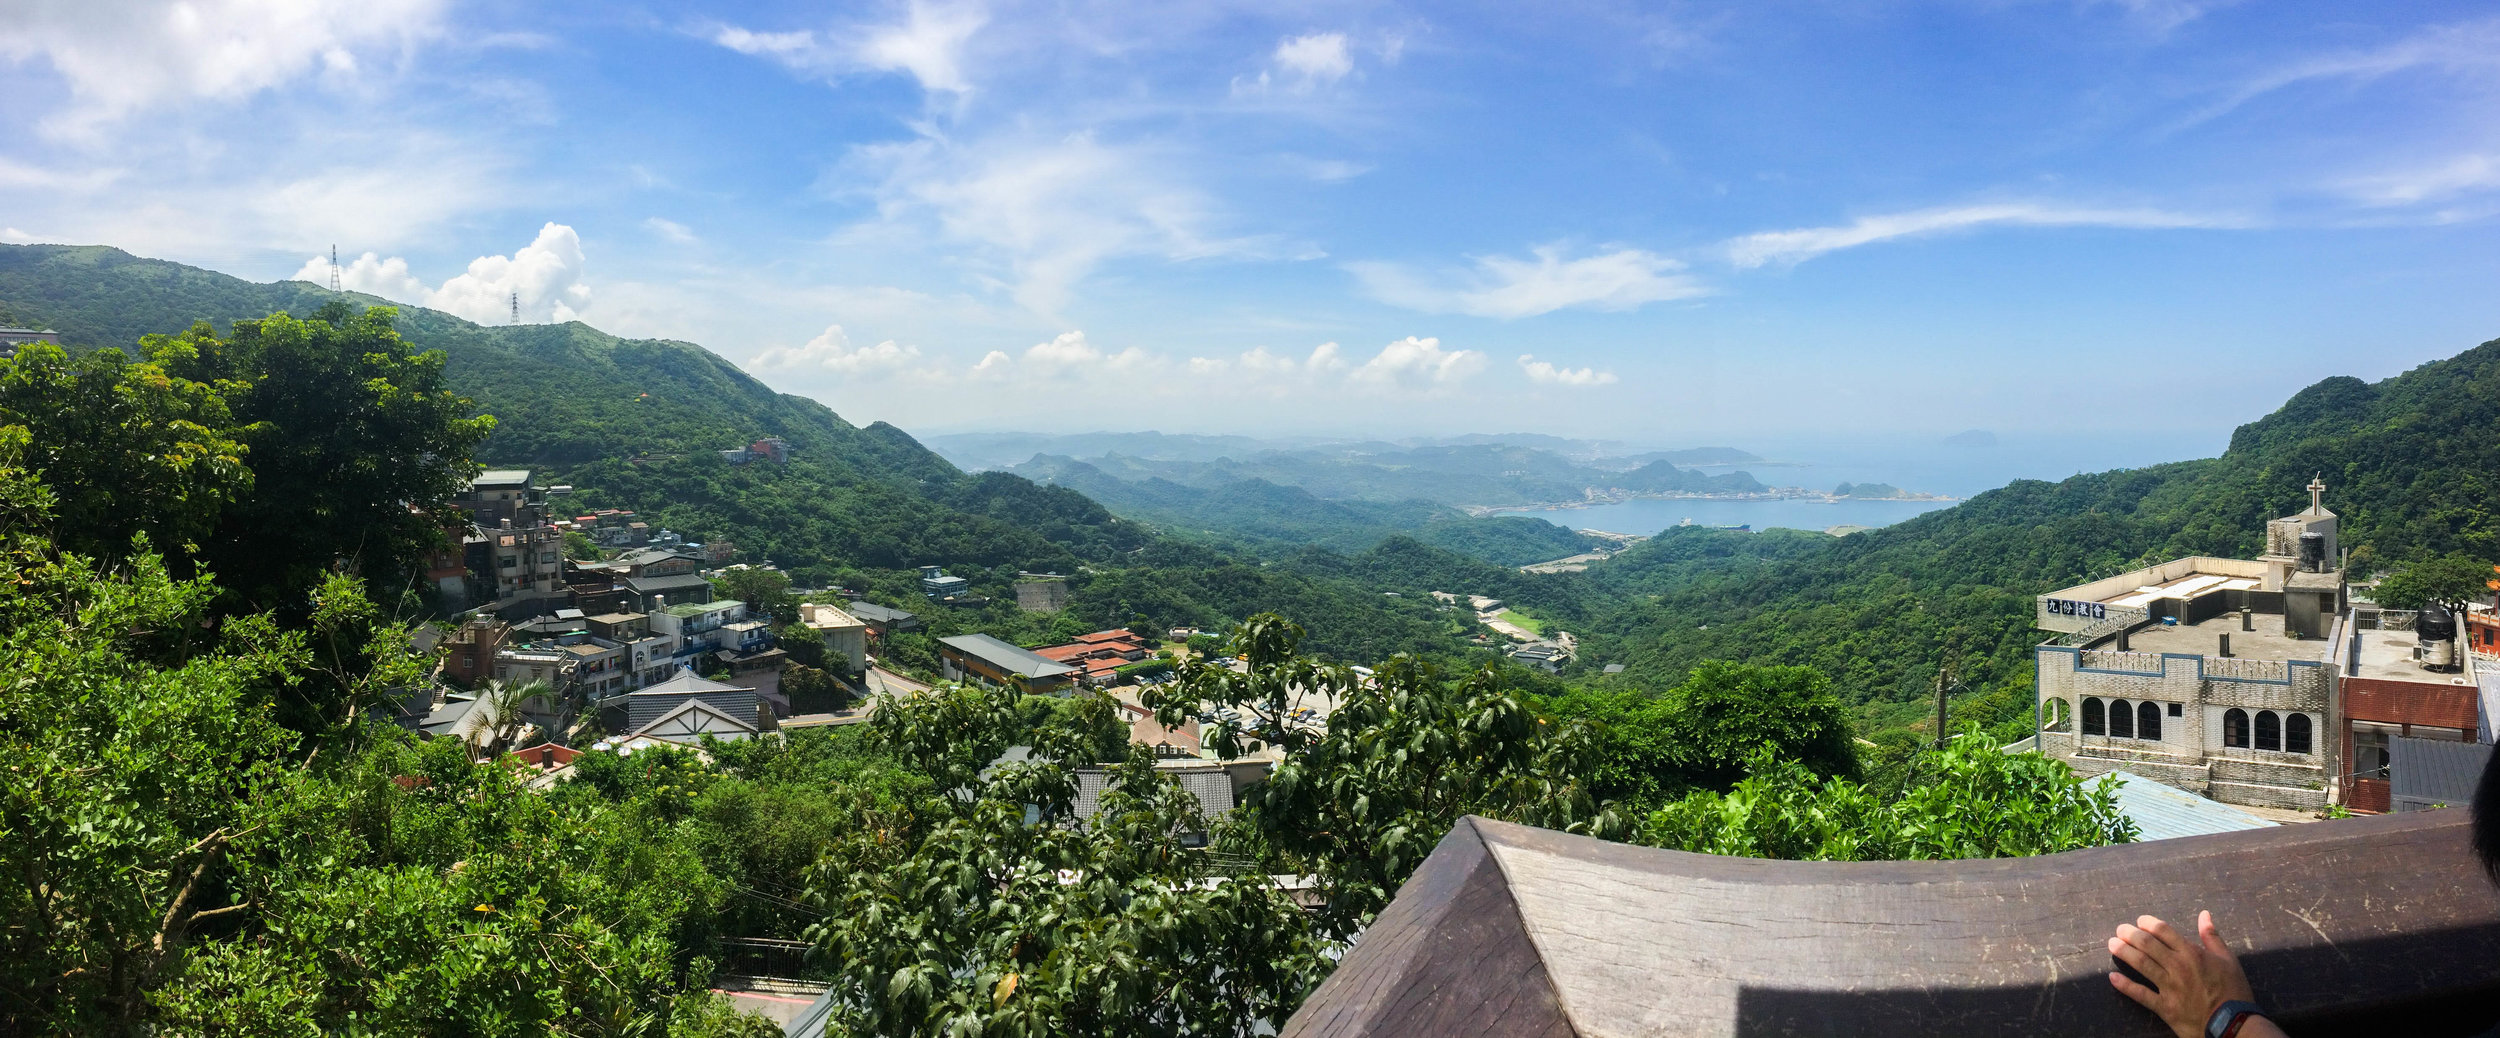 Taiwan (27 of 13).jpg